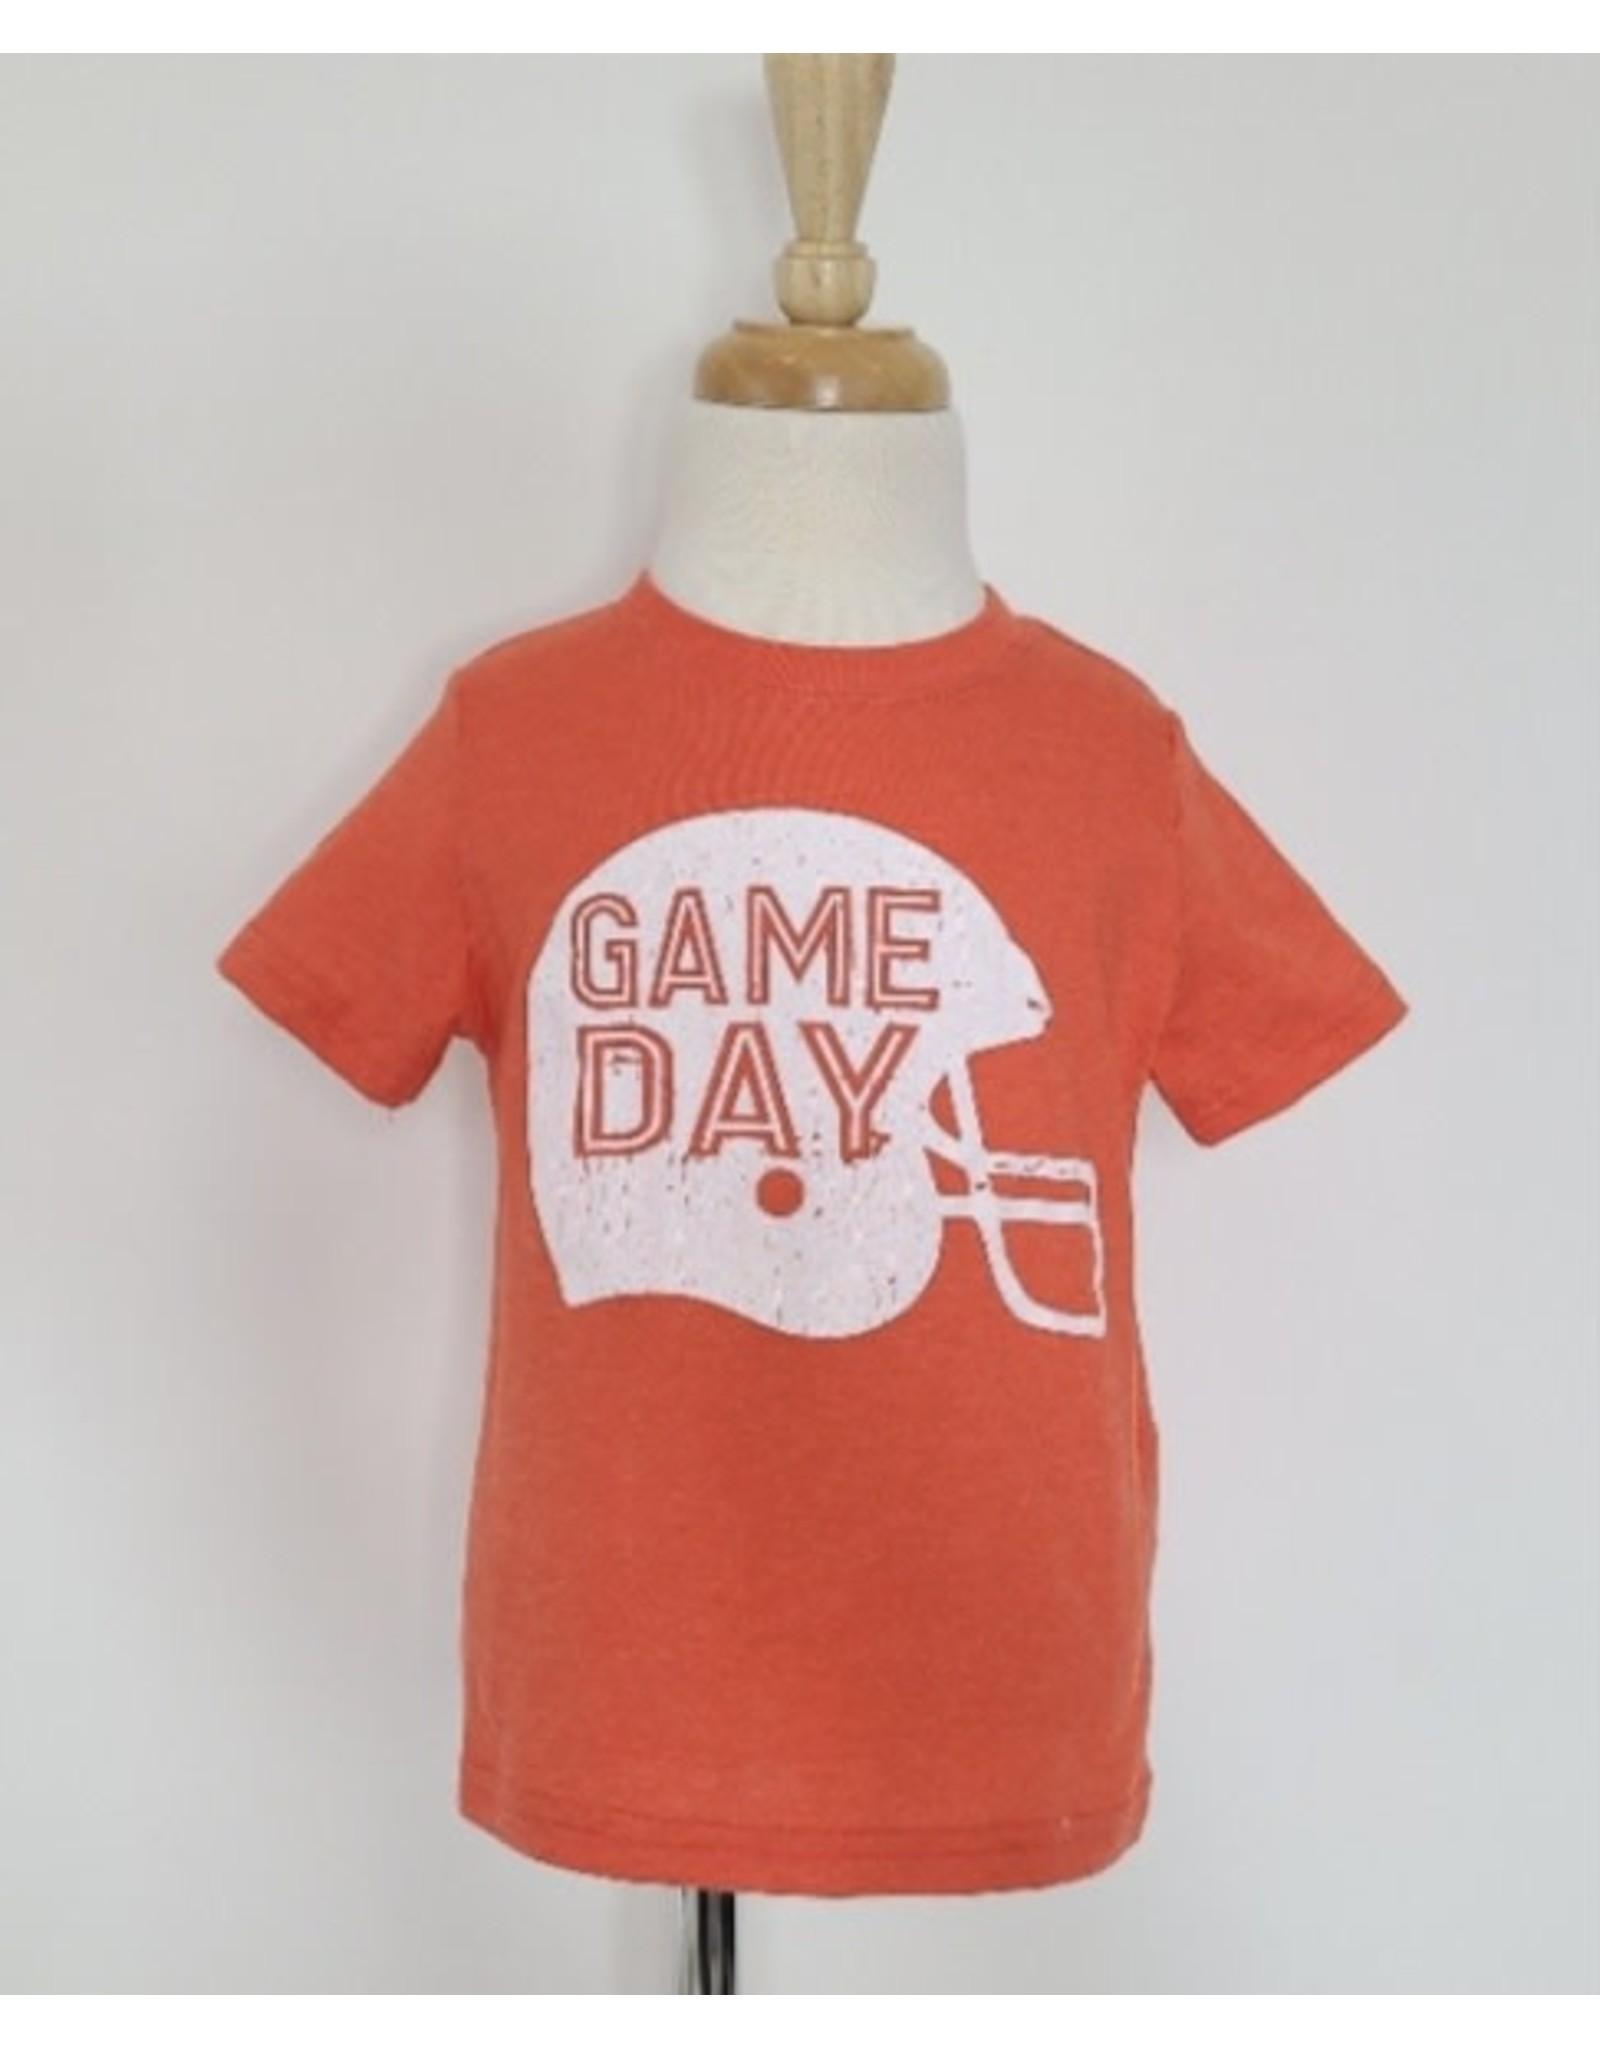 GAME DAY Helmet Tee: Orange